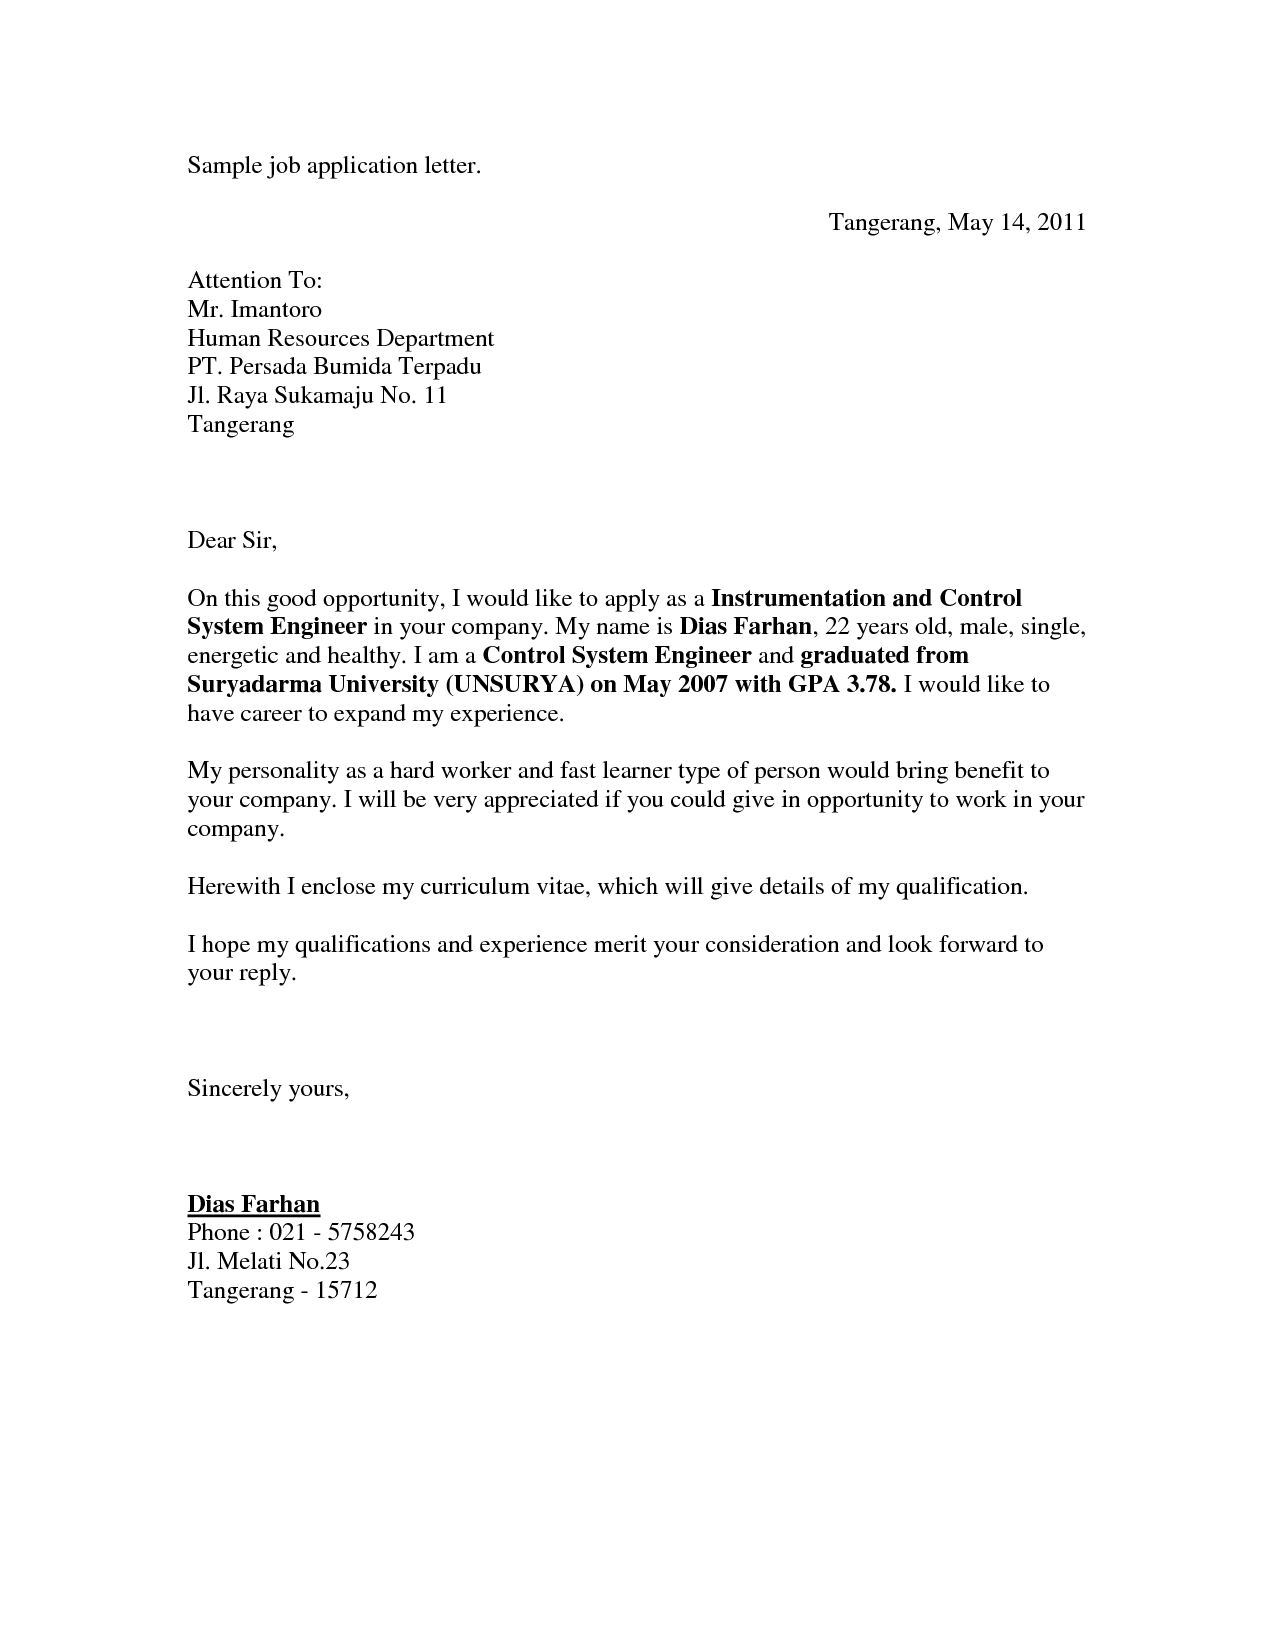 Letter Application Letter Sample For Unadvertised Job Sample and